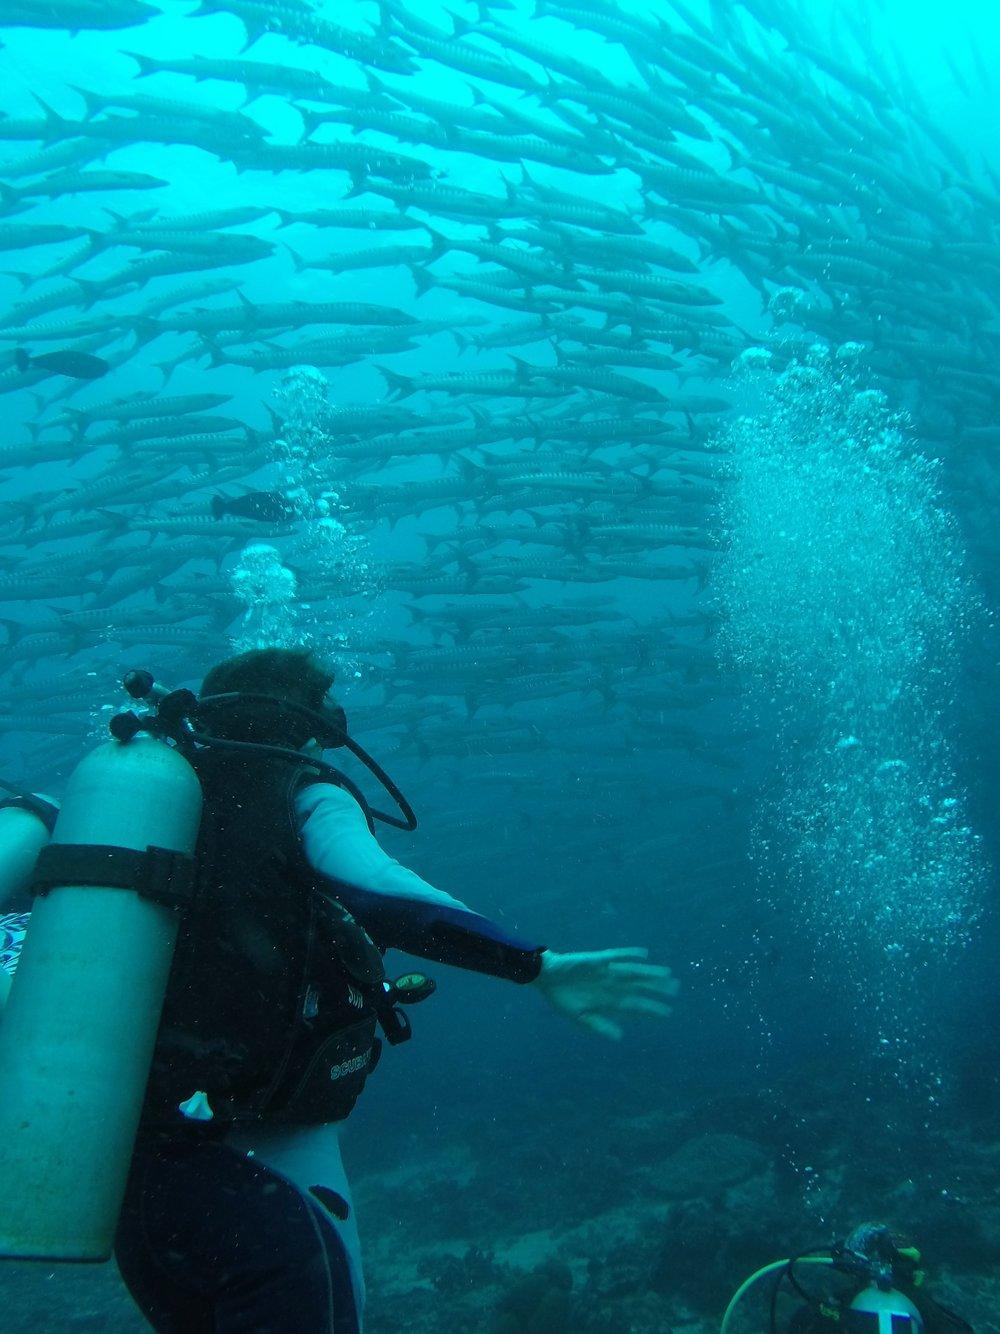 A spiralling shoal barracuda's